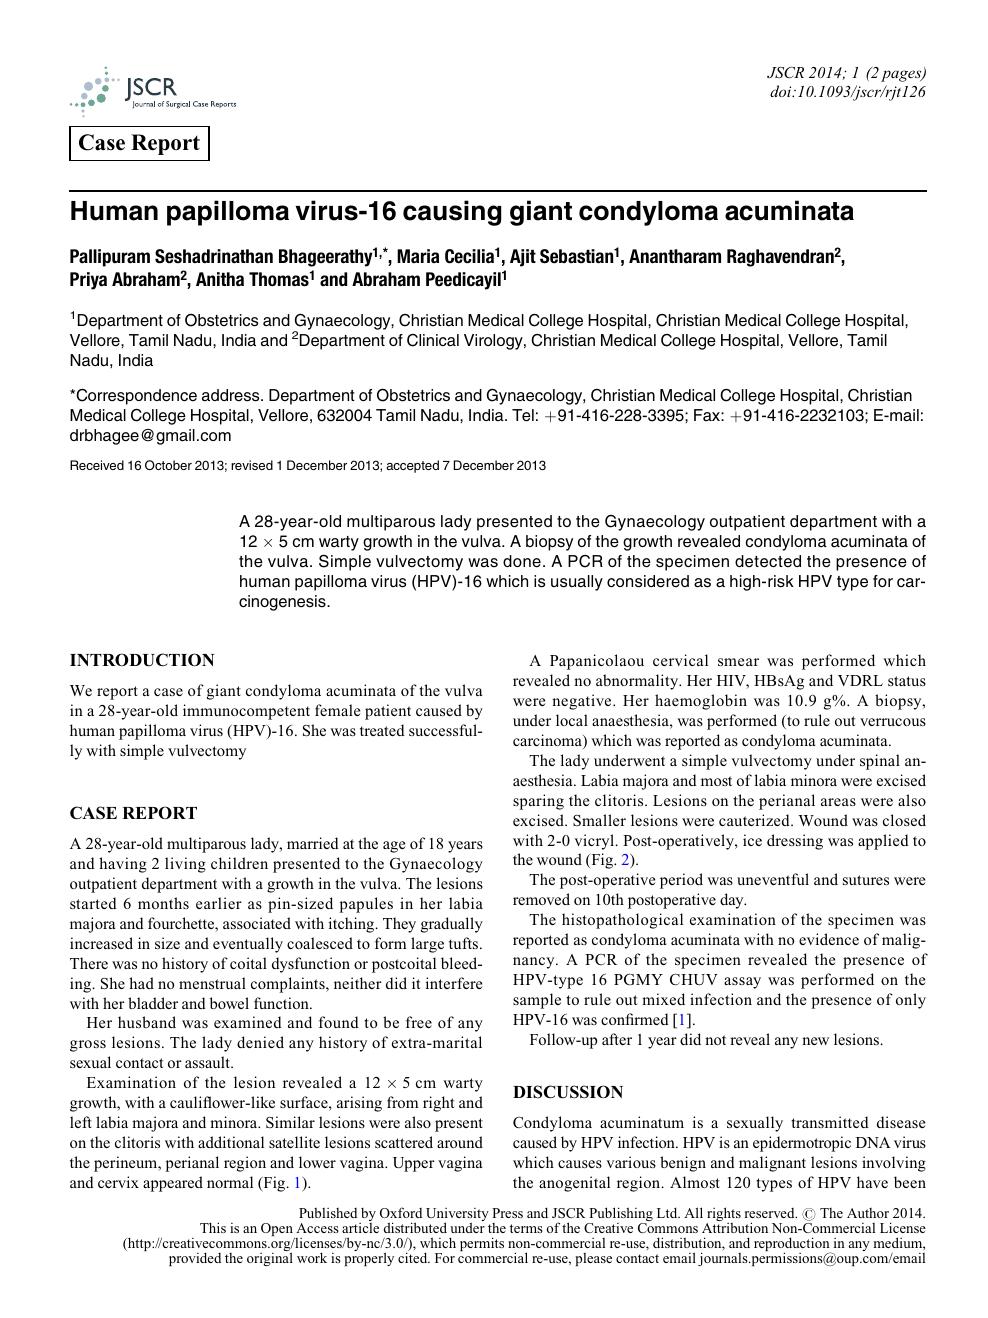 Condyloma acuminata hpv type - Revista Societatii de Medicina Interna